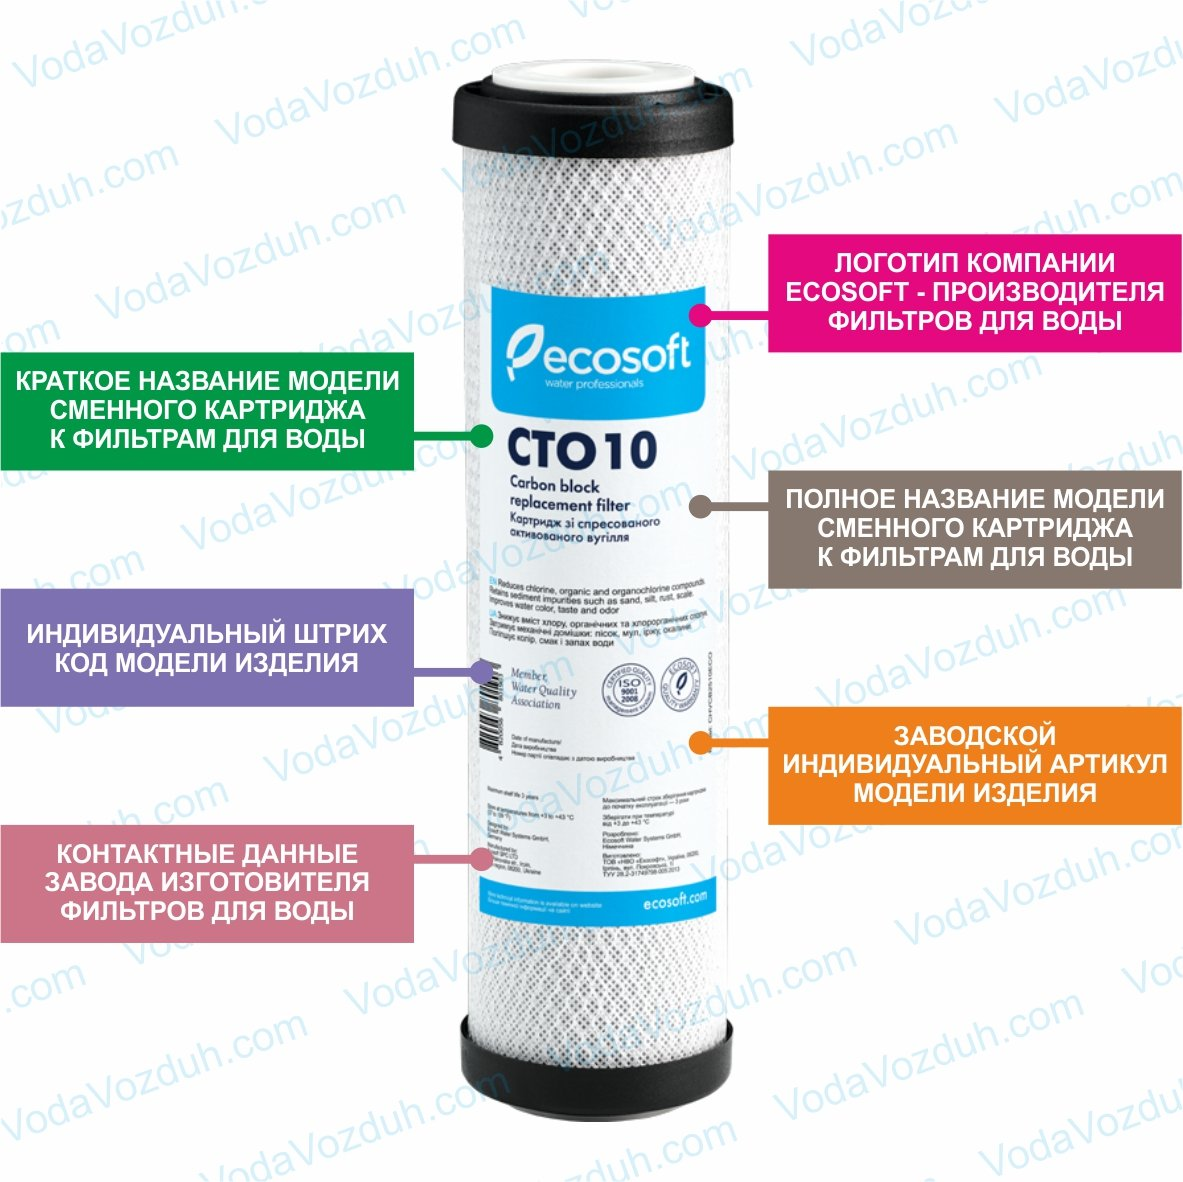 Ecosoft CTO10 CHVCB2510ECO